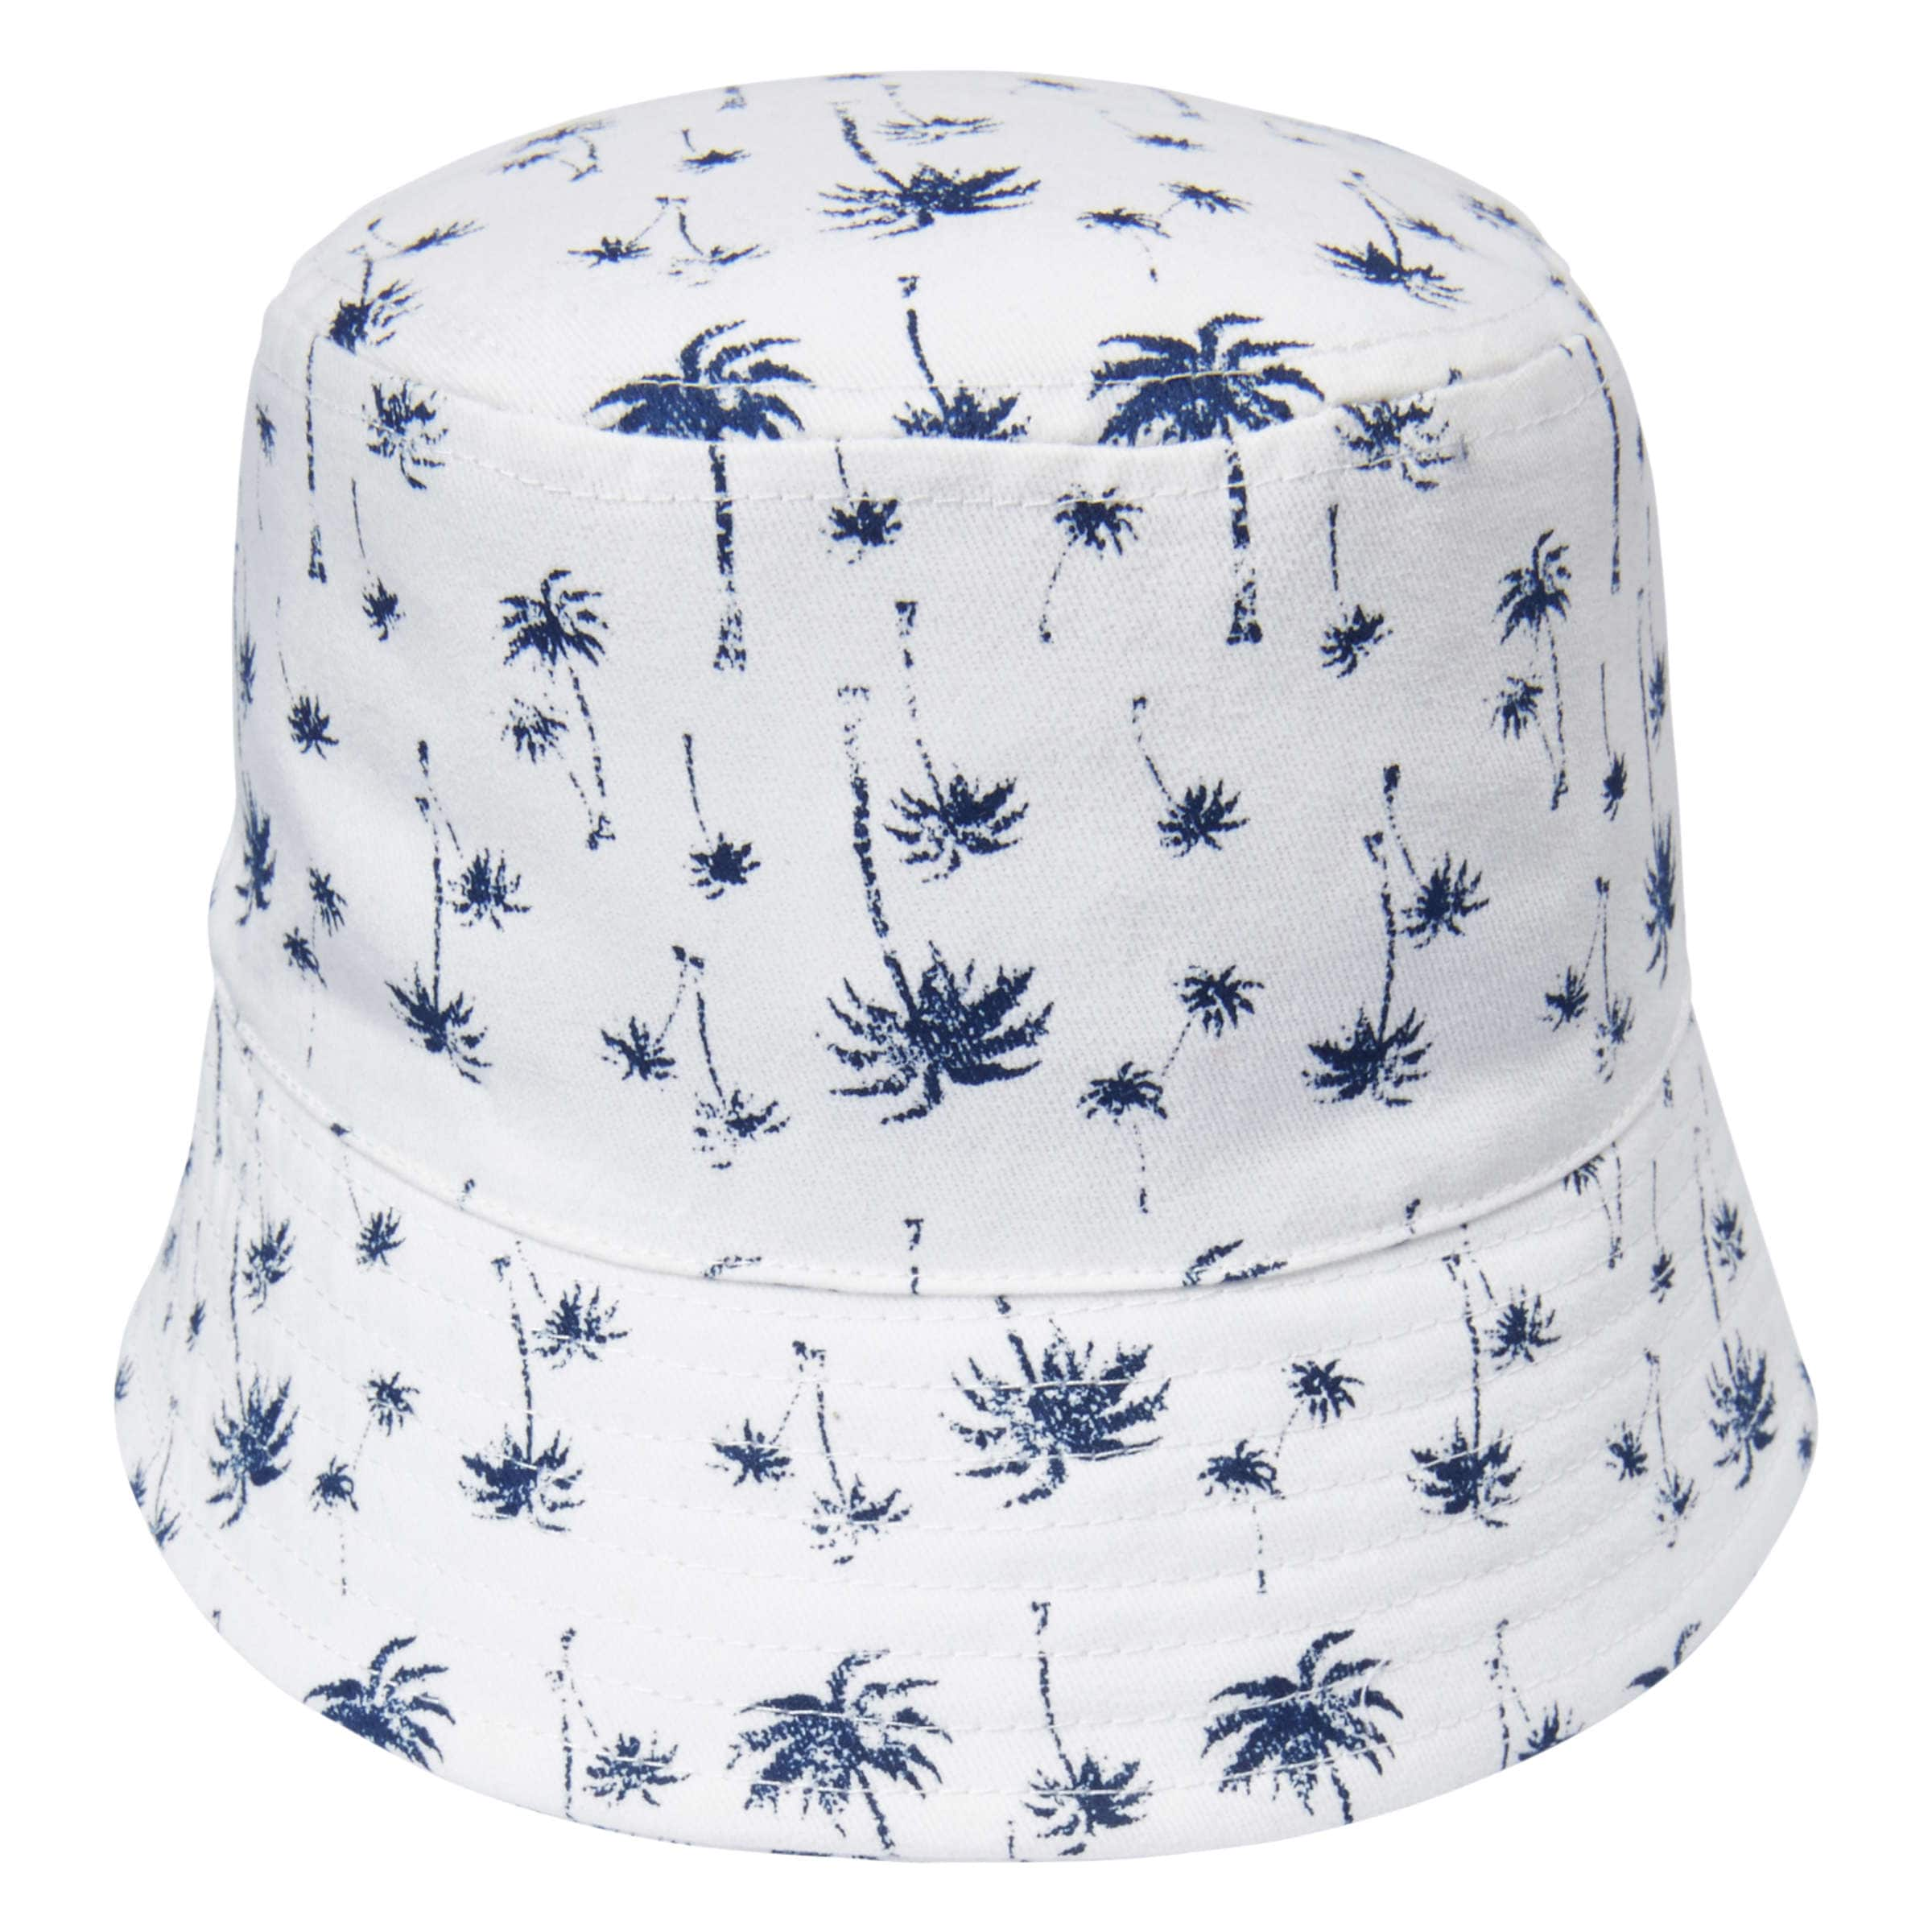 Baby Boys  Bucket Hat in White from Joe Fresh 8e08fb06a67